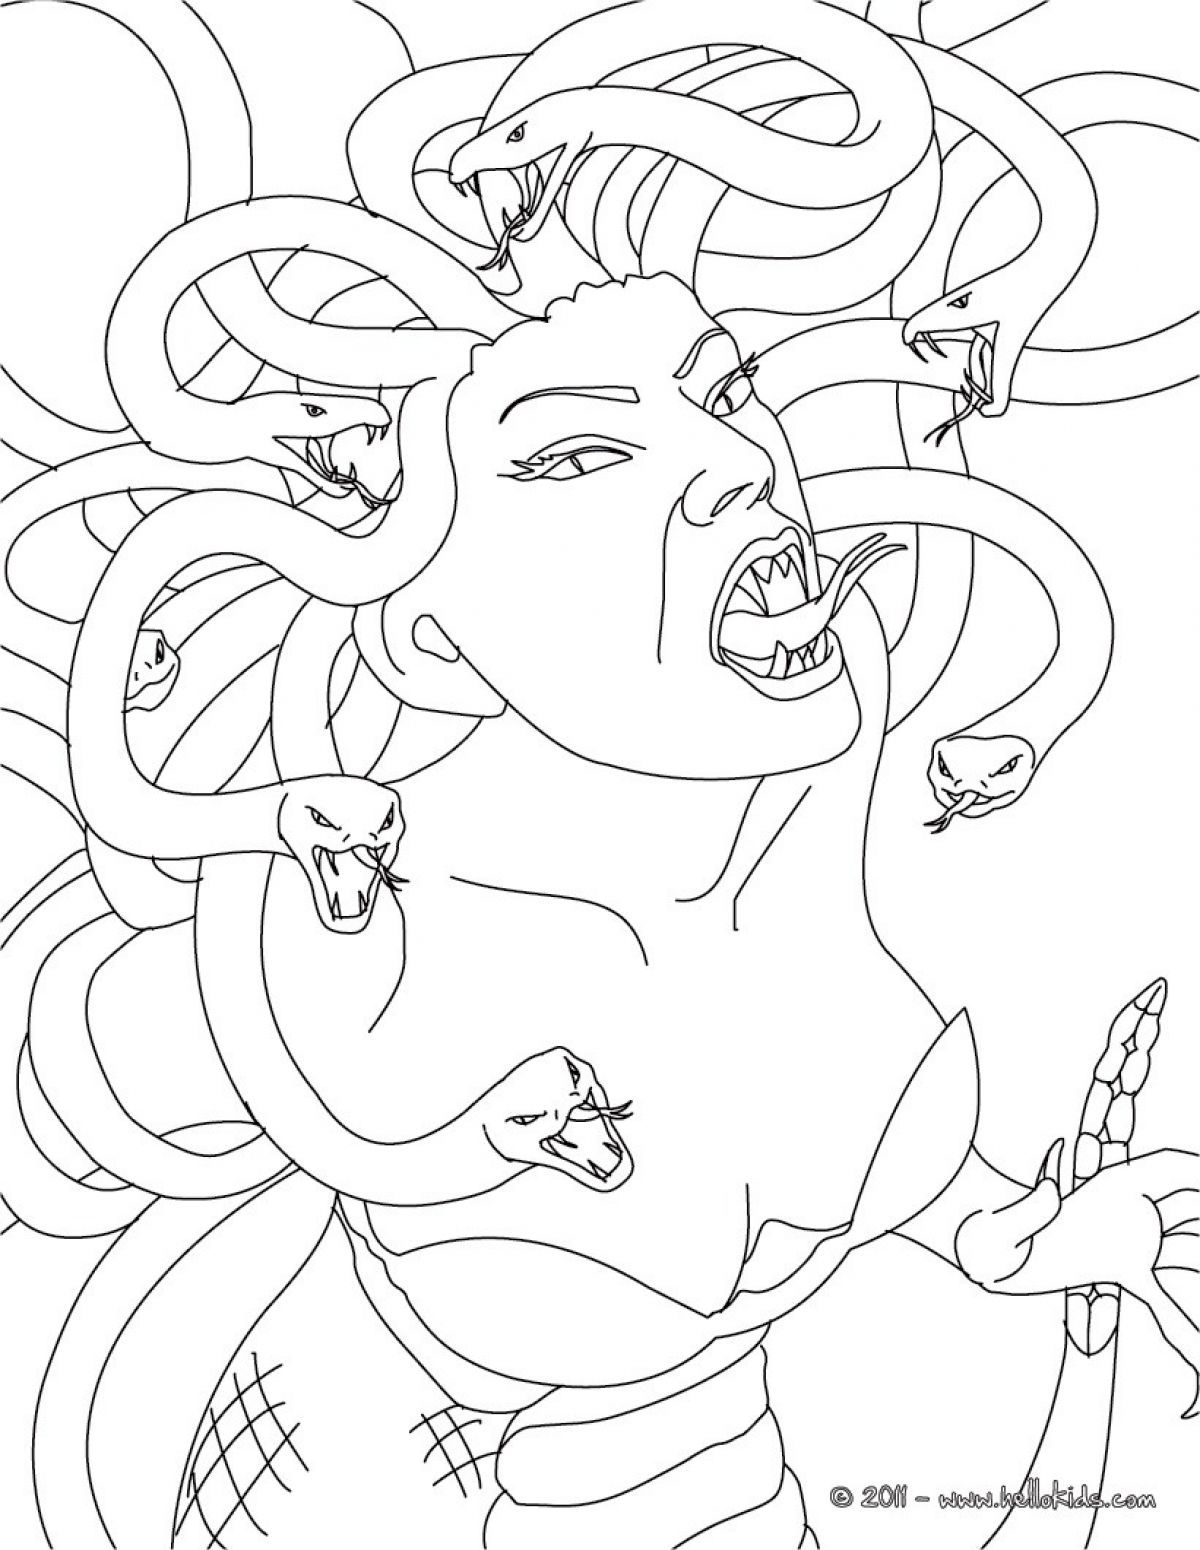 Printable coloring pages greek mythology -  Greek Mythology Colouring Pages Coloring